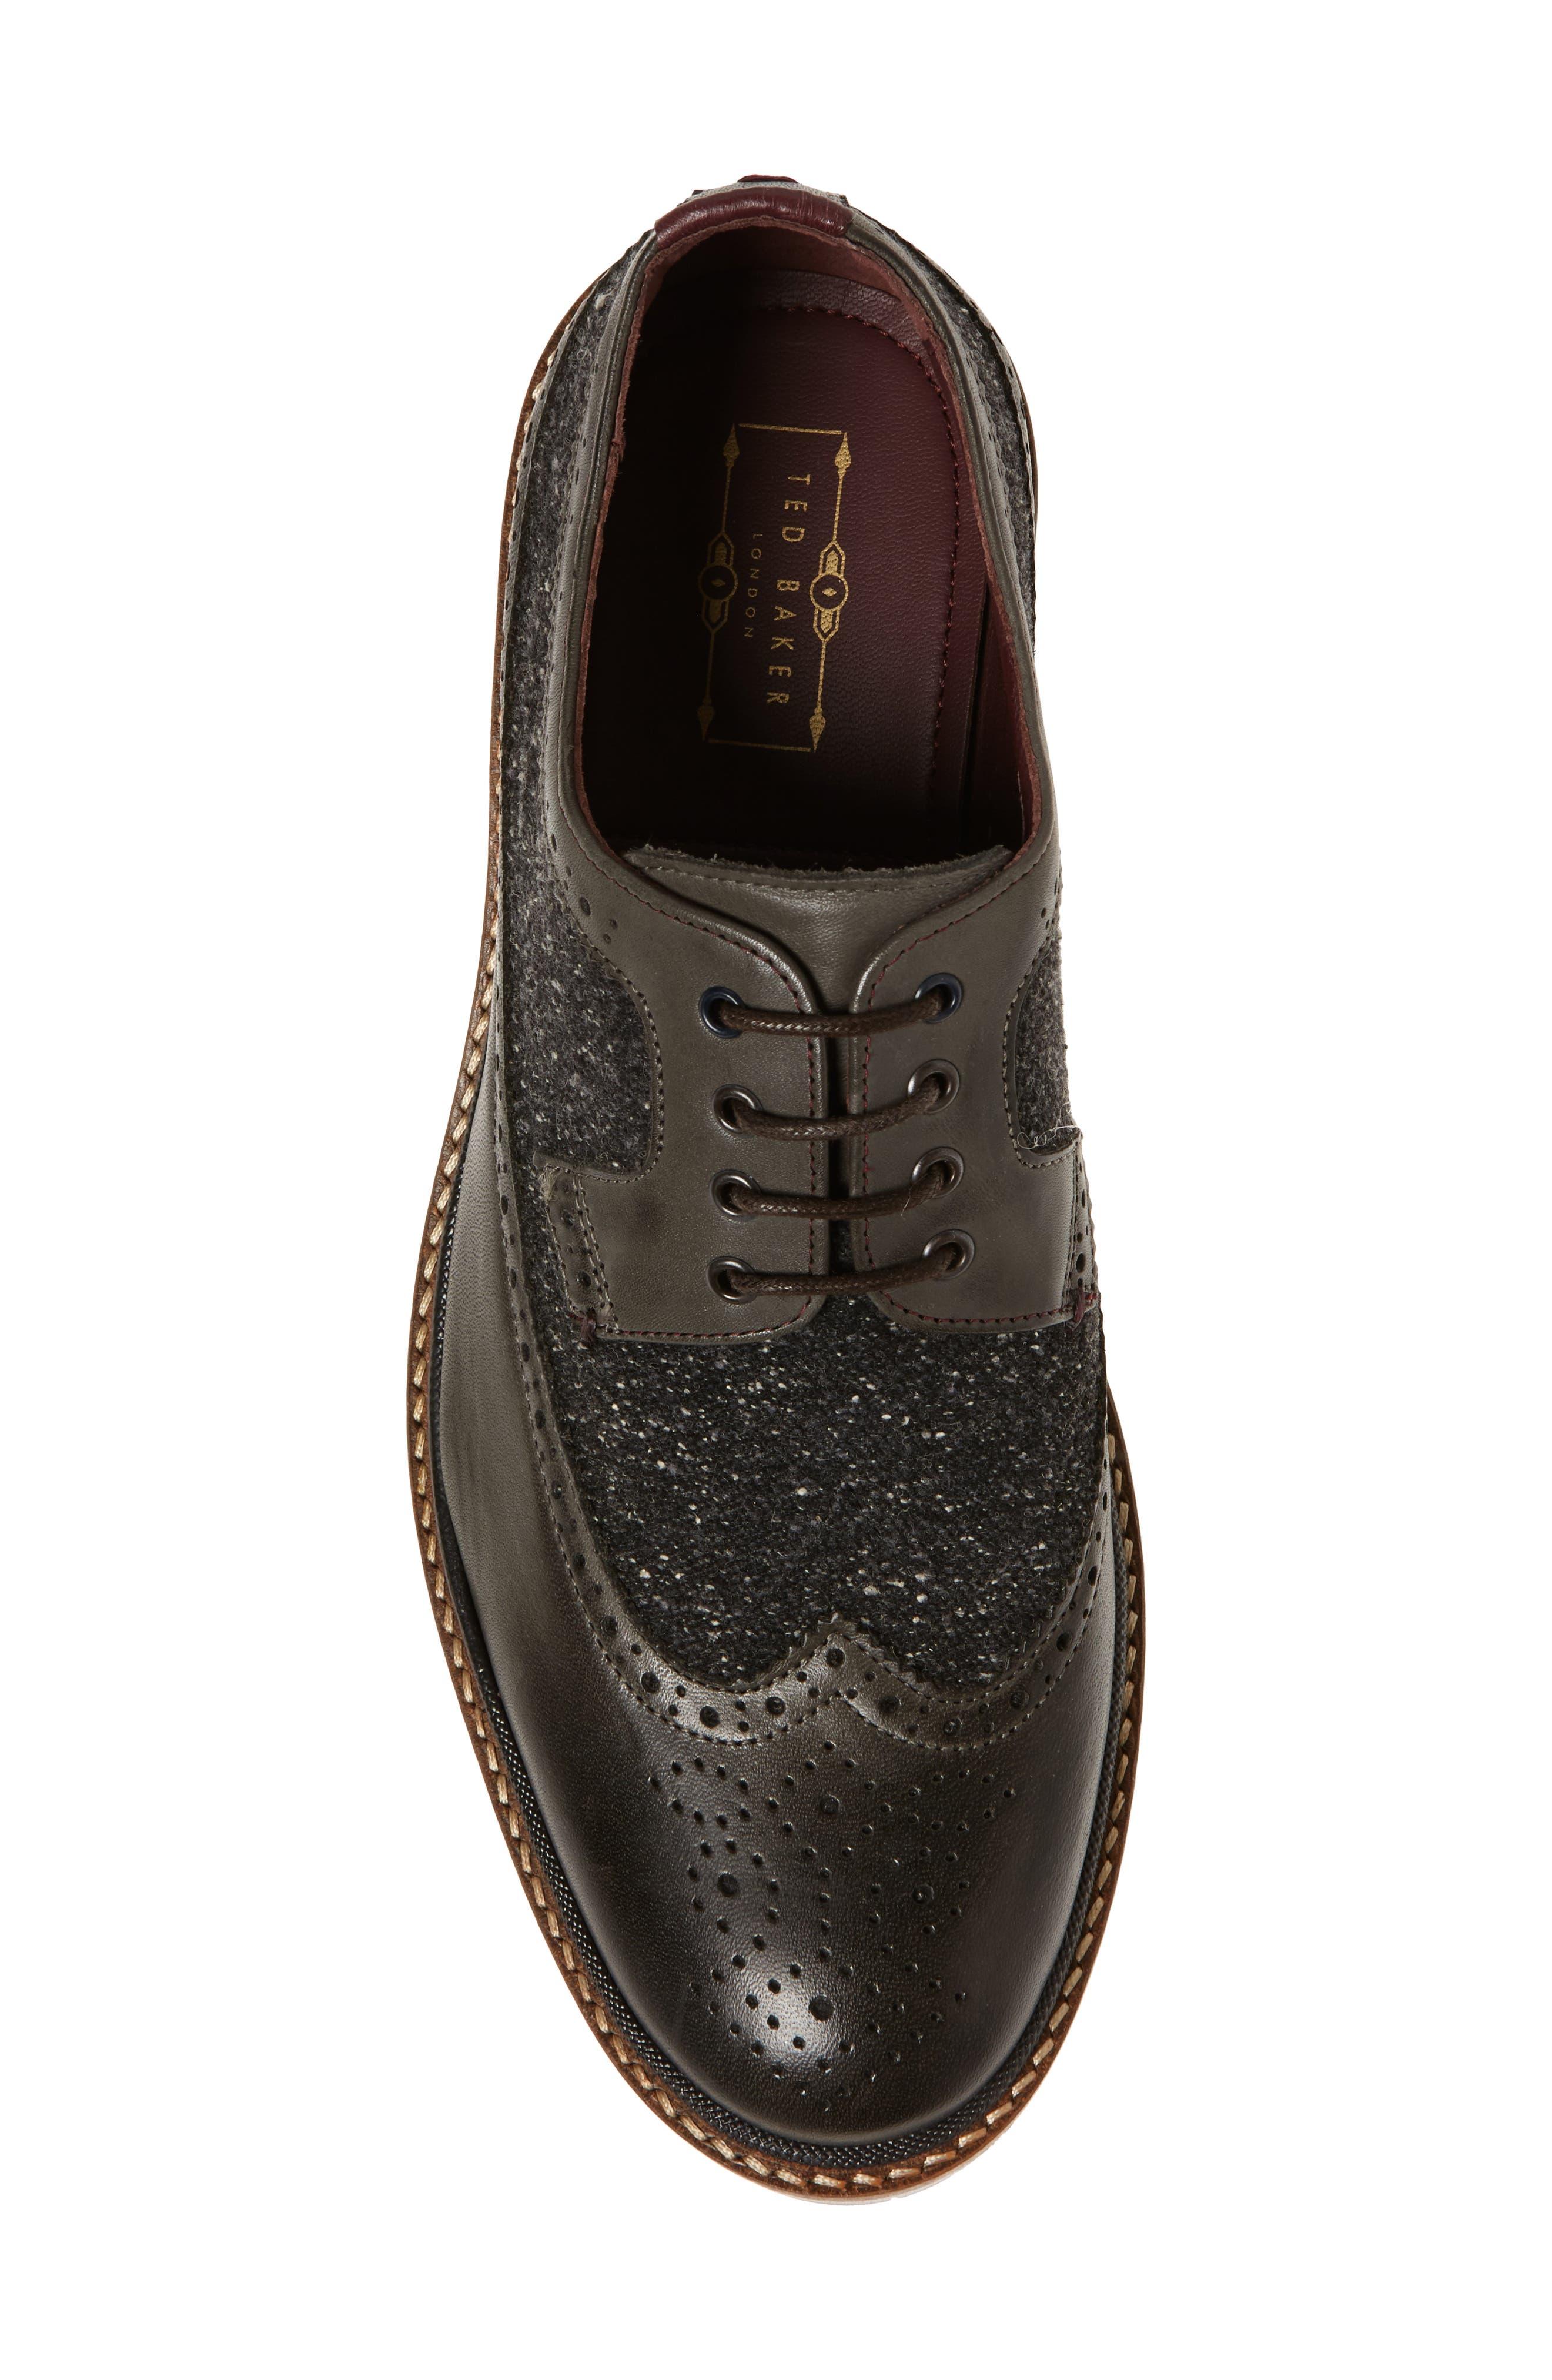 Casbo Spectator Shoe,                             Alternate thumbnail 5, color,                             080